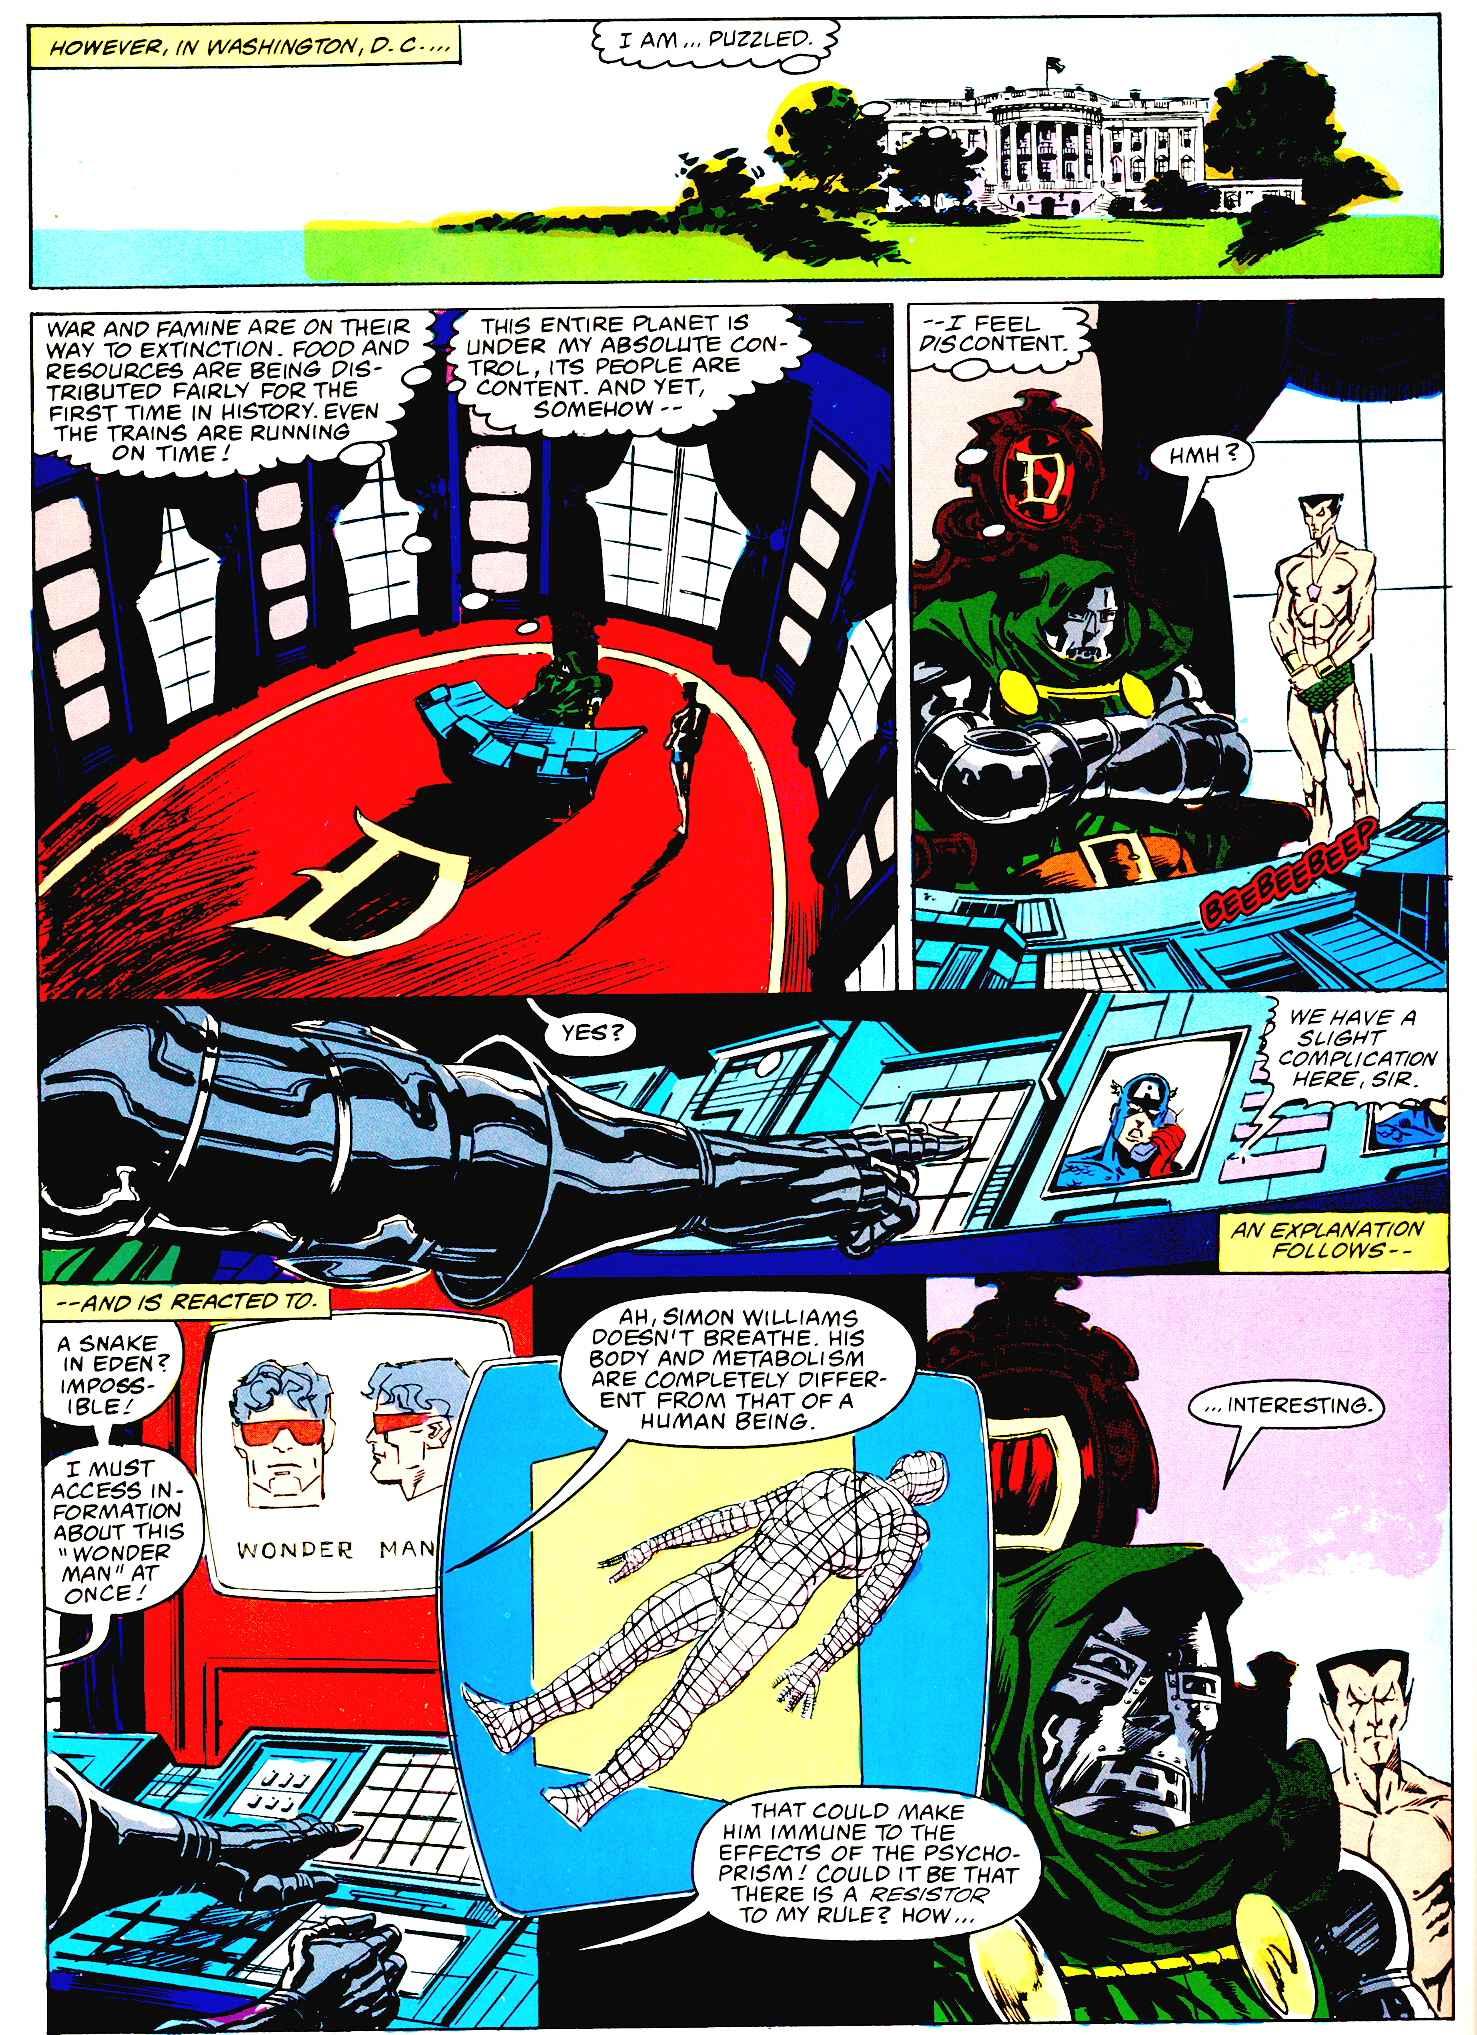 scans_daily | Marvel Graphic Novel #27 - Emperor Doom